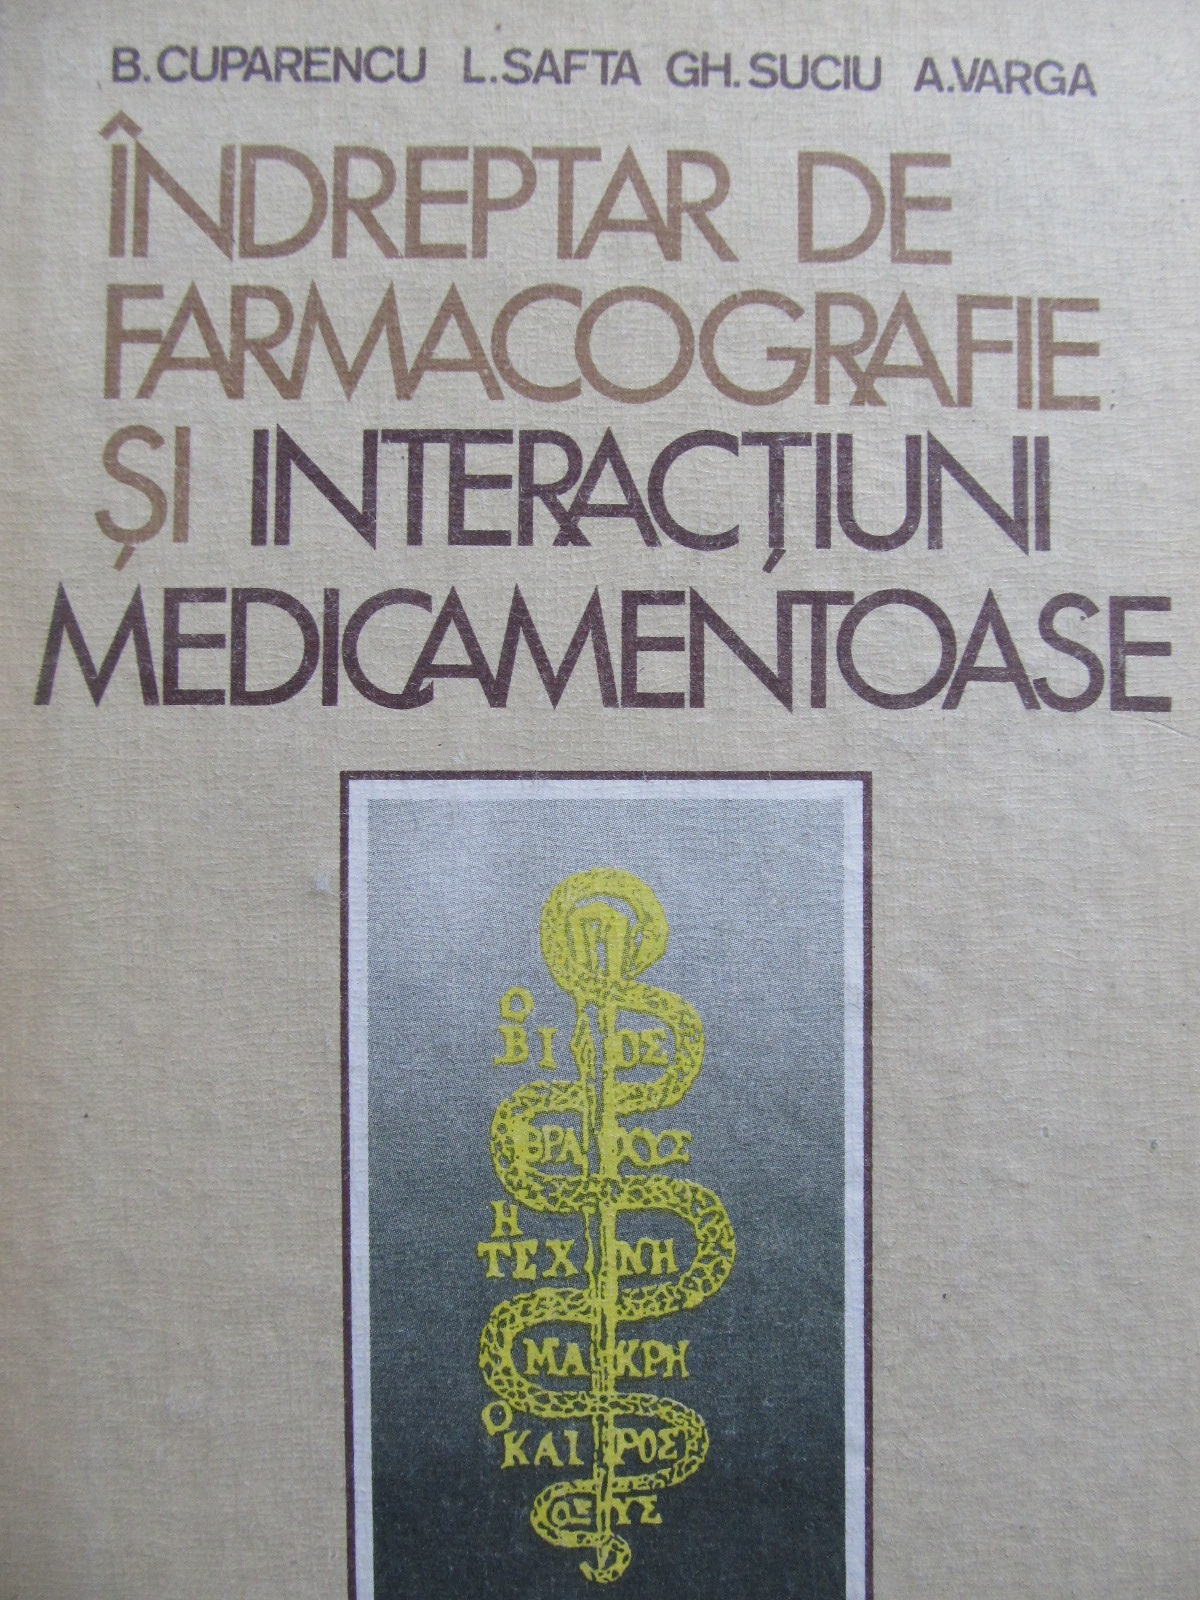 Indreptar de farmacografie si interactiuni medicamentoase - B. Cuparencu , ... | Detalii carte